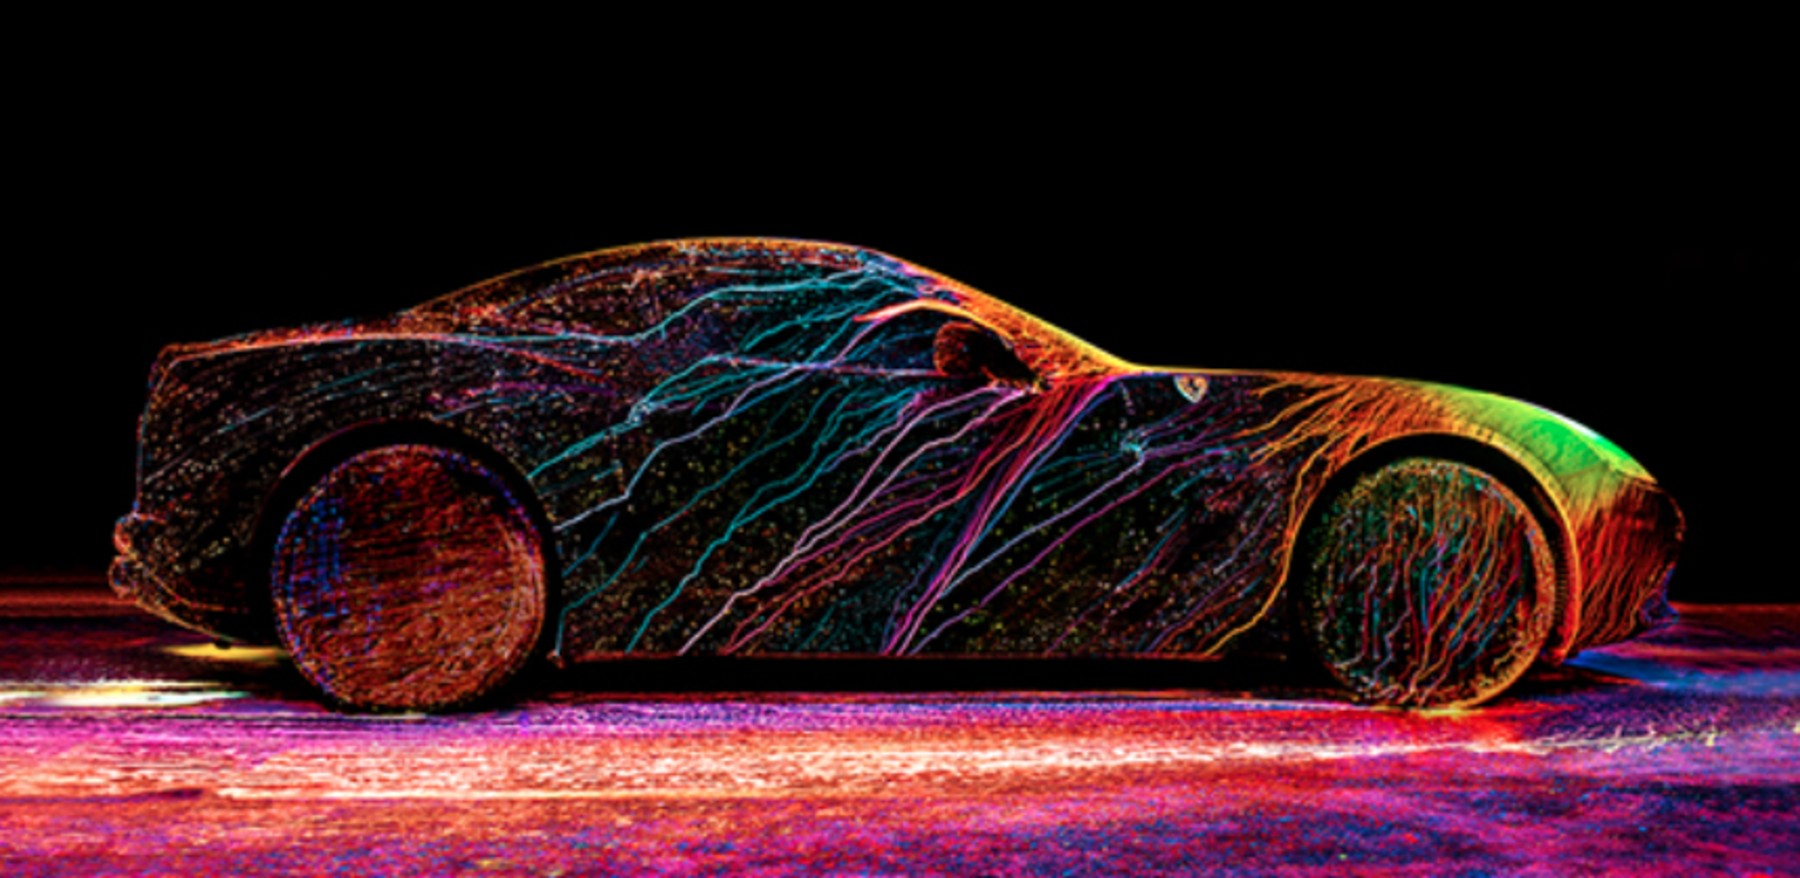 Ferrari + UV Paint + Wind Tunnel = AMAZING.